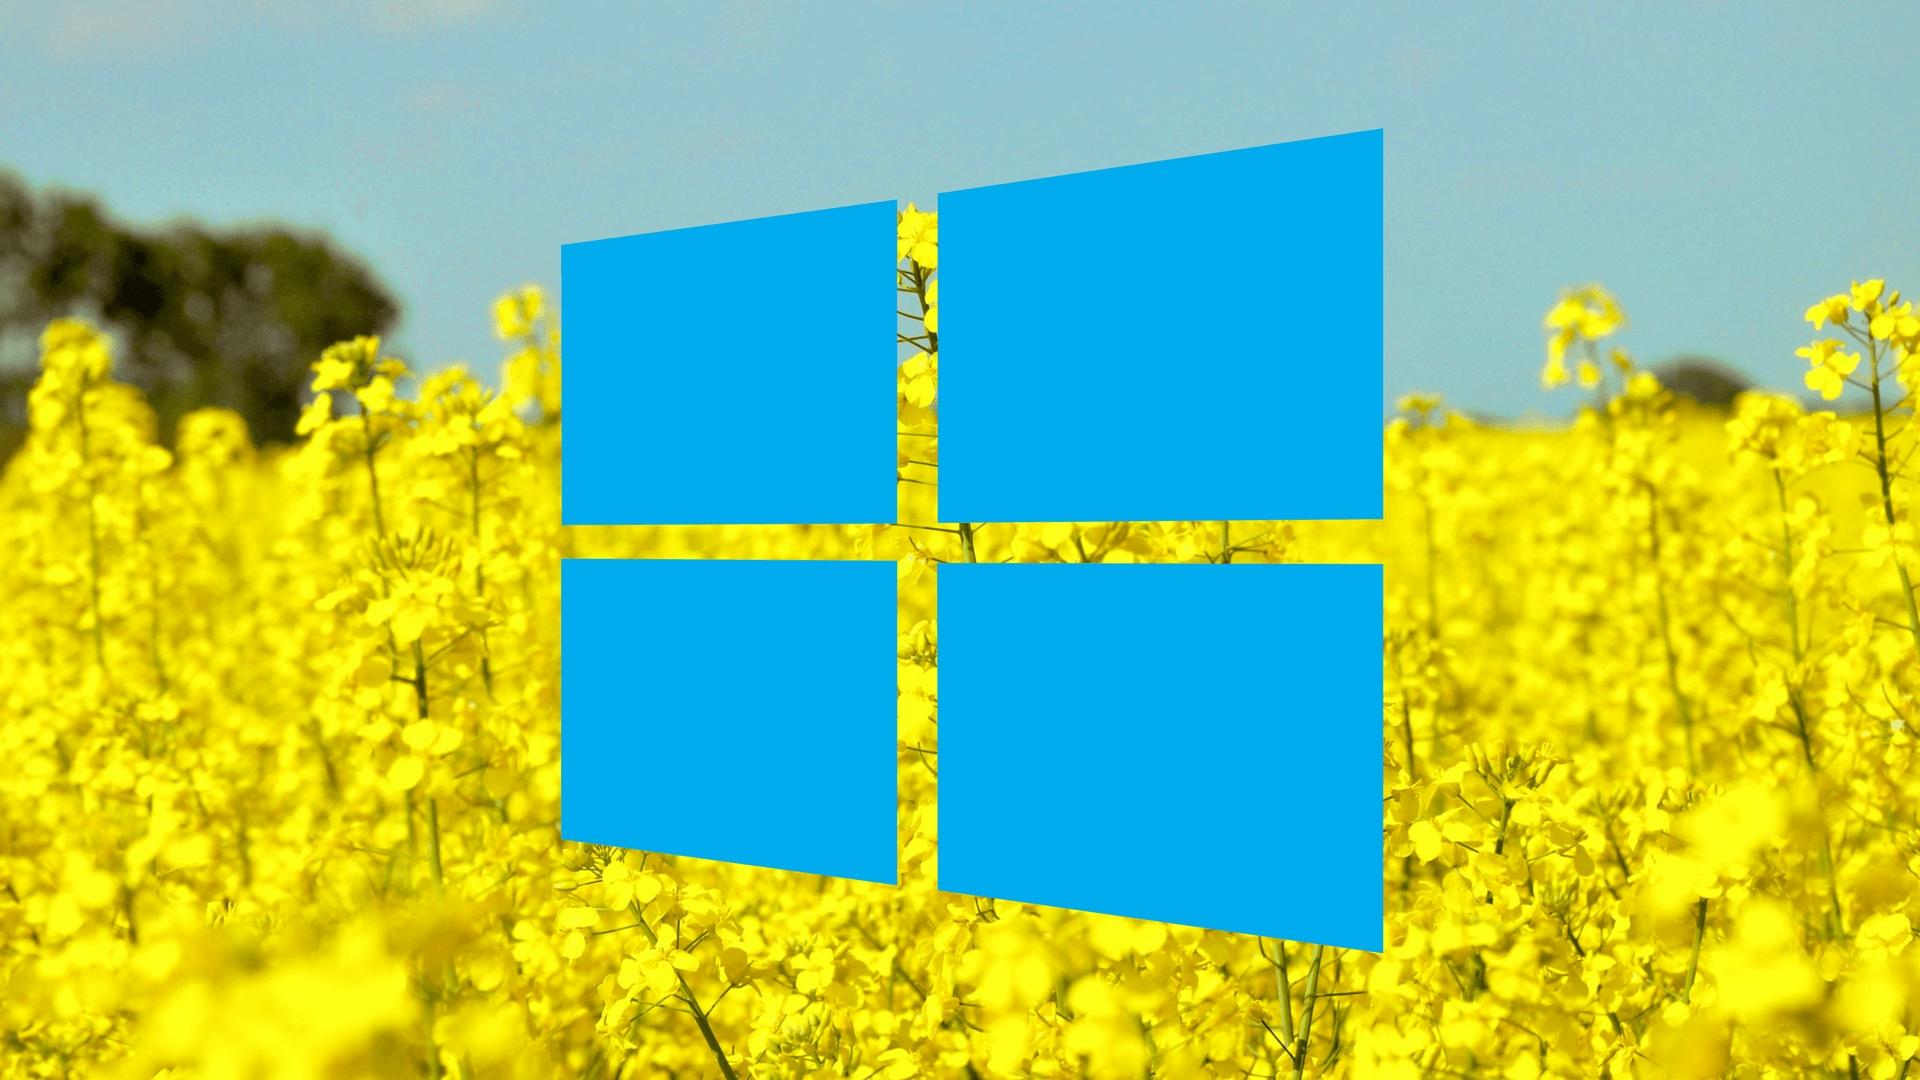 Windows 10 a Office 2016 nyní v akci [sponzorovaný článek]